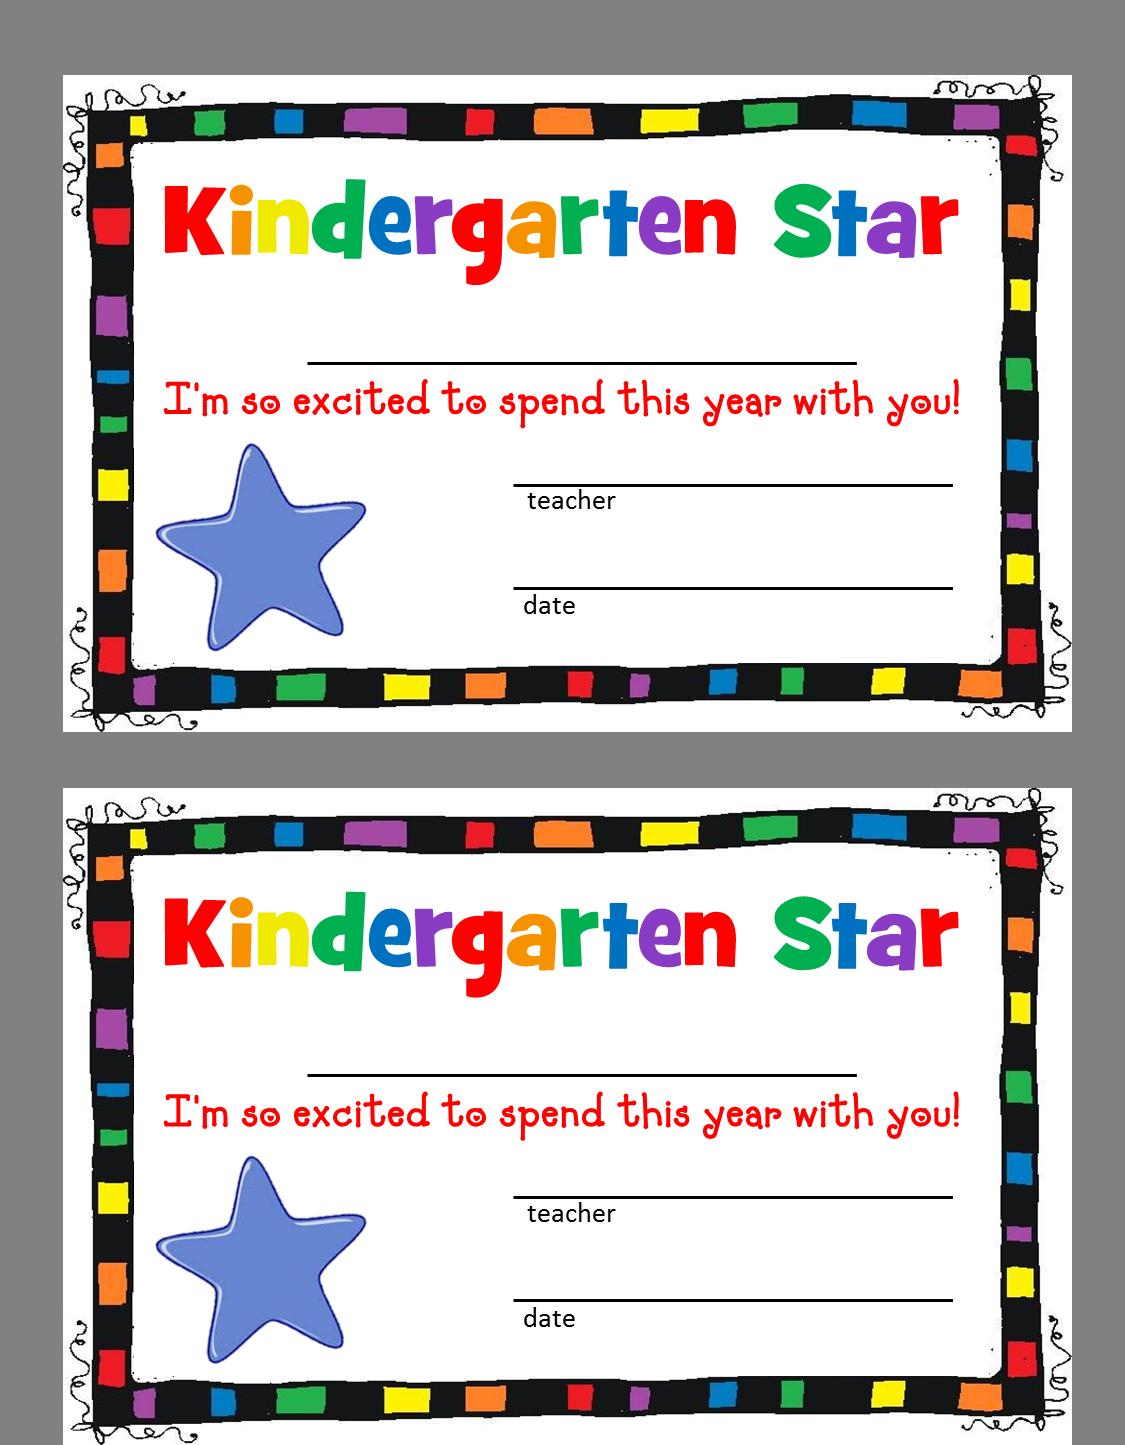 Nursery clipart boarder. Preschool free printable